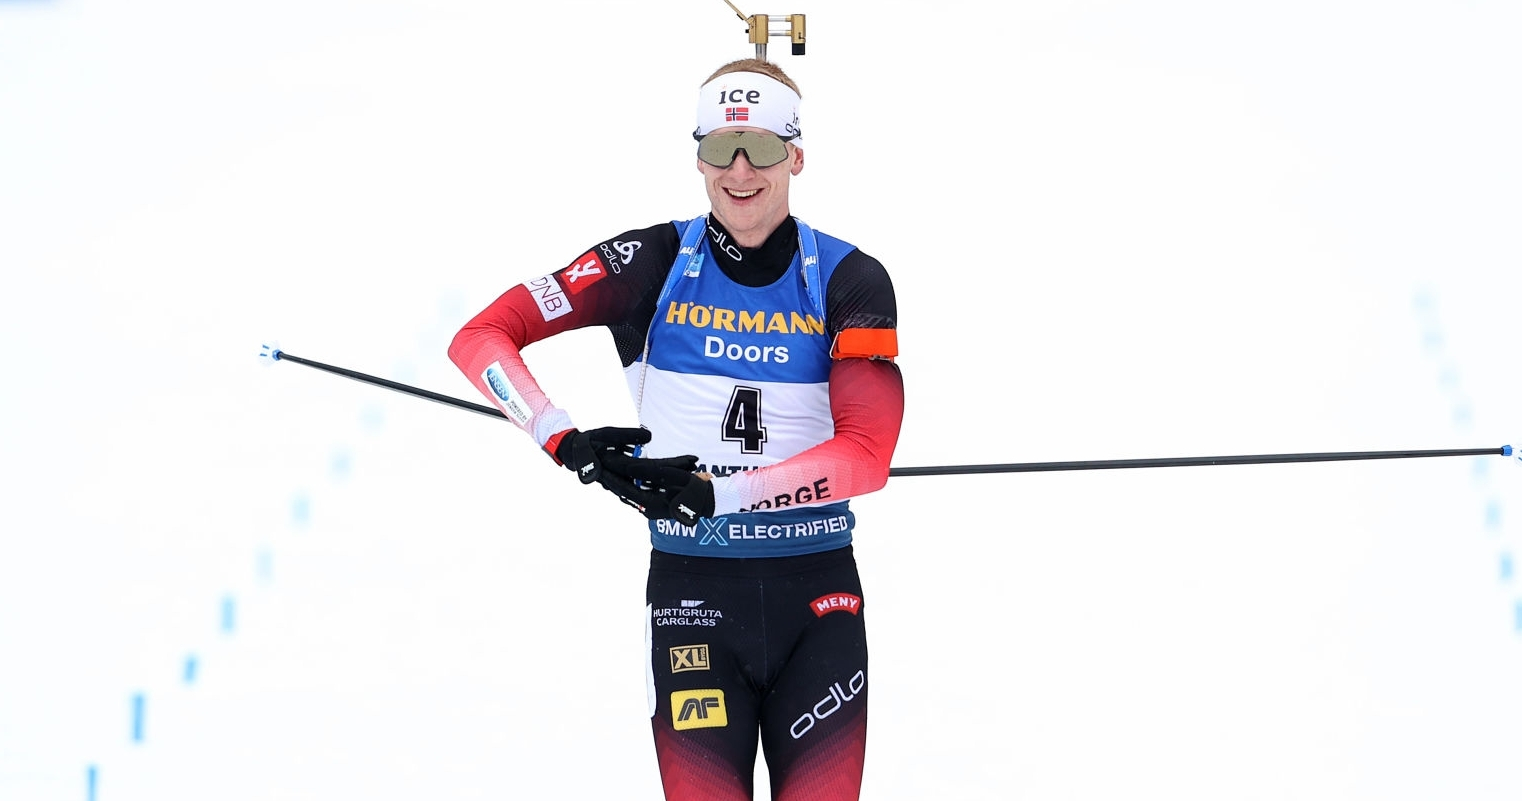 Чемпионат мира по биатлону, Йоханнес Бо, сборная Норвегии